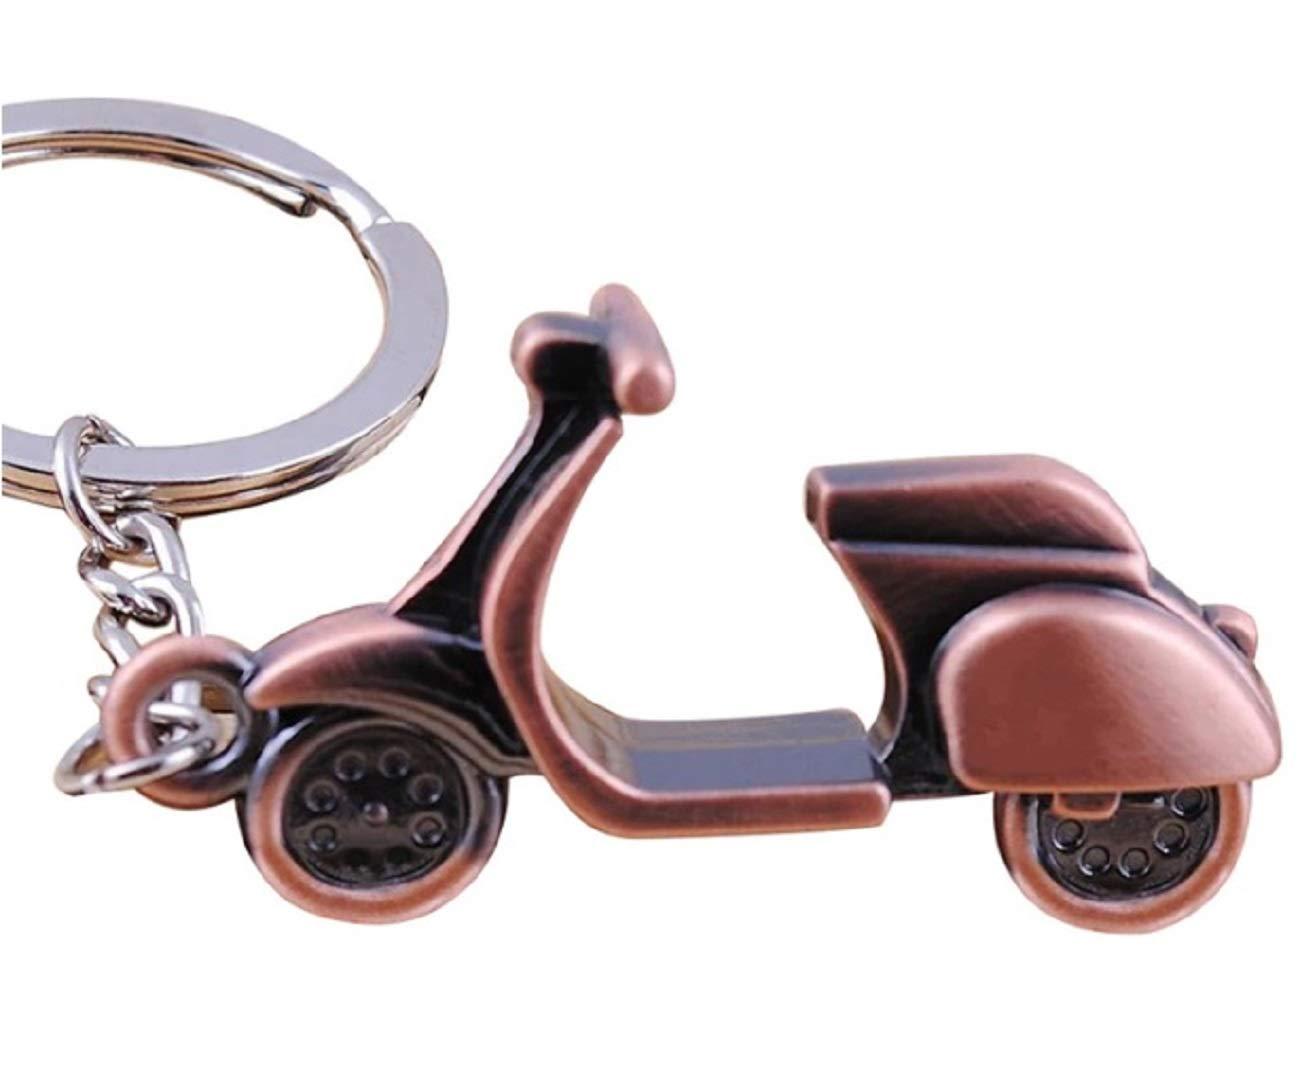 Sportigo /® Motorroller Schl/üsselanh/änger//Roller in der Farbe Bronze//Retro Look//Geschenk